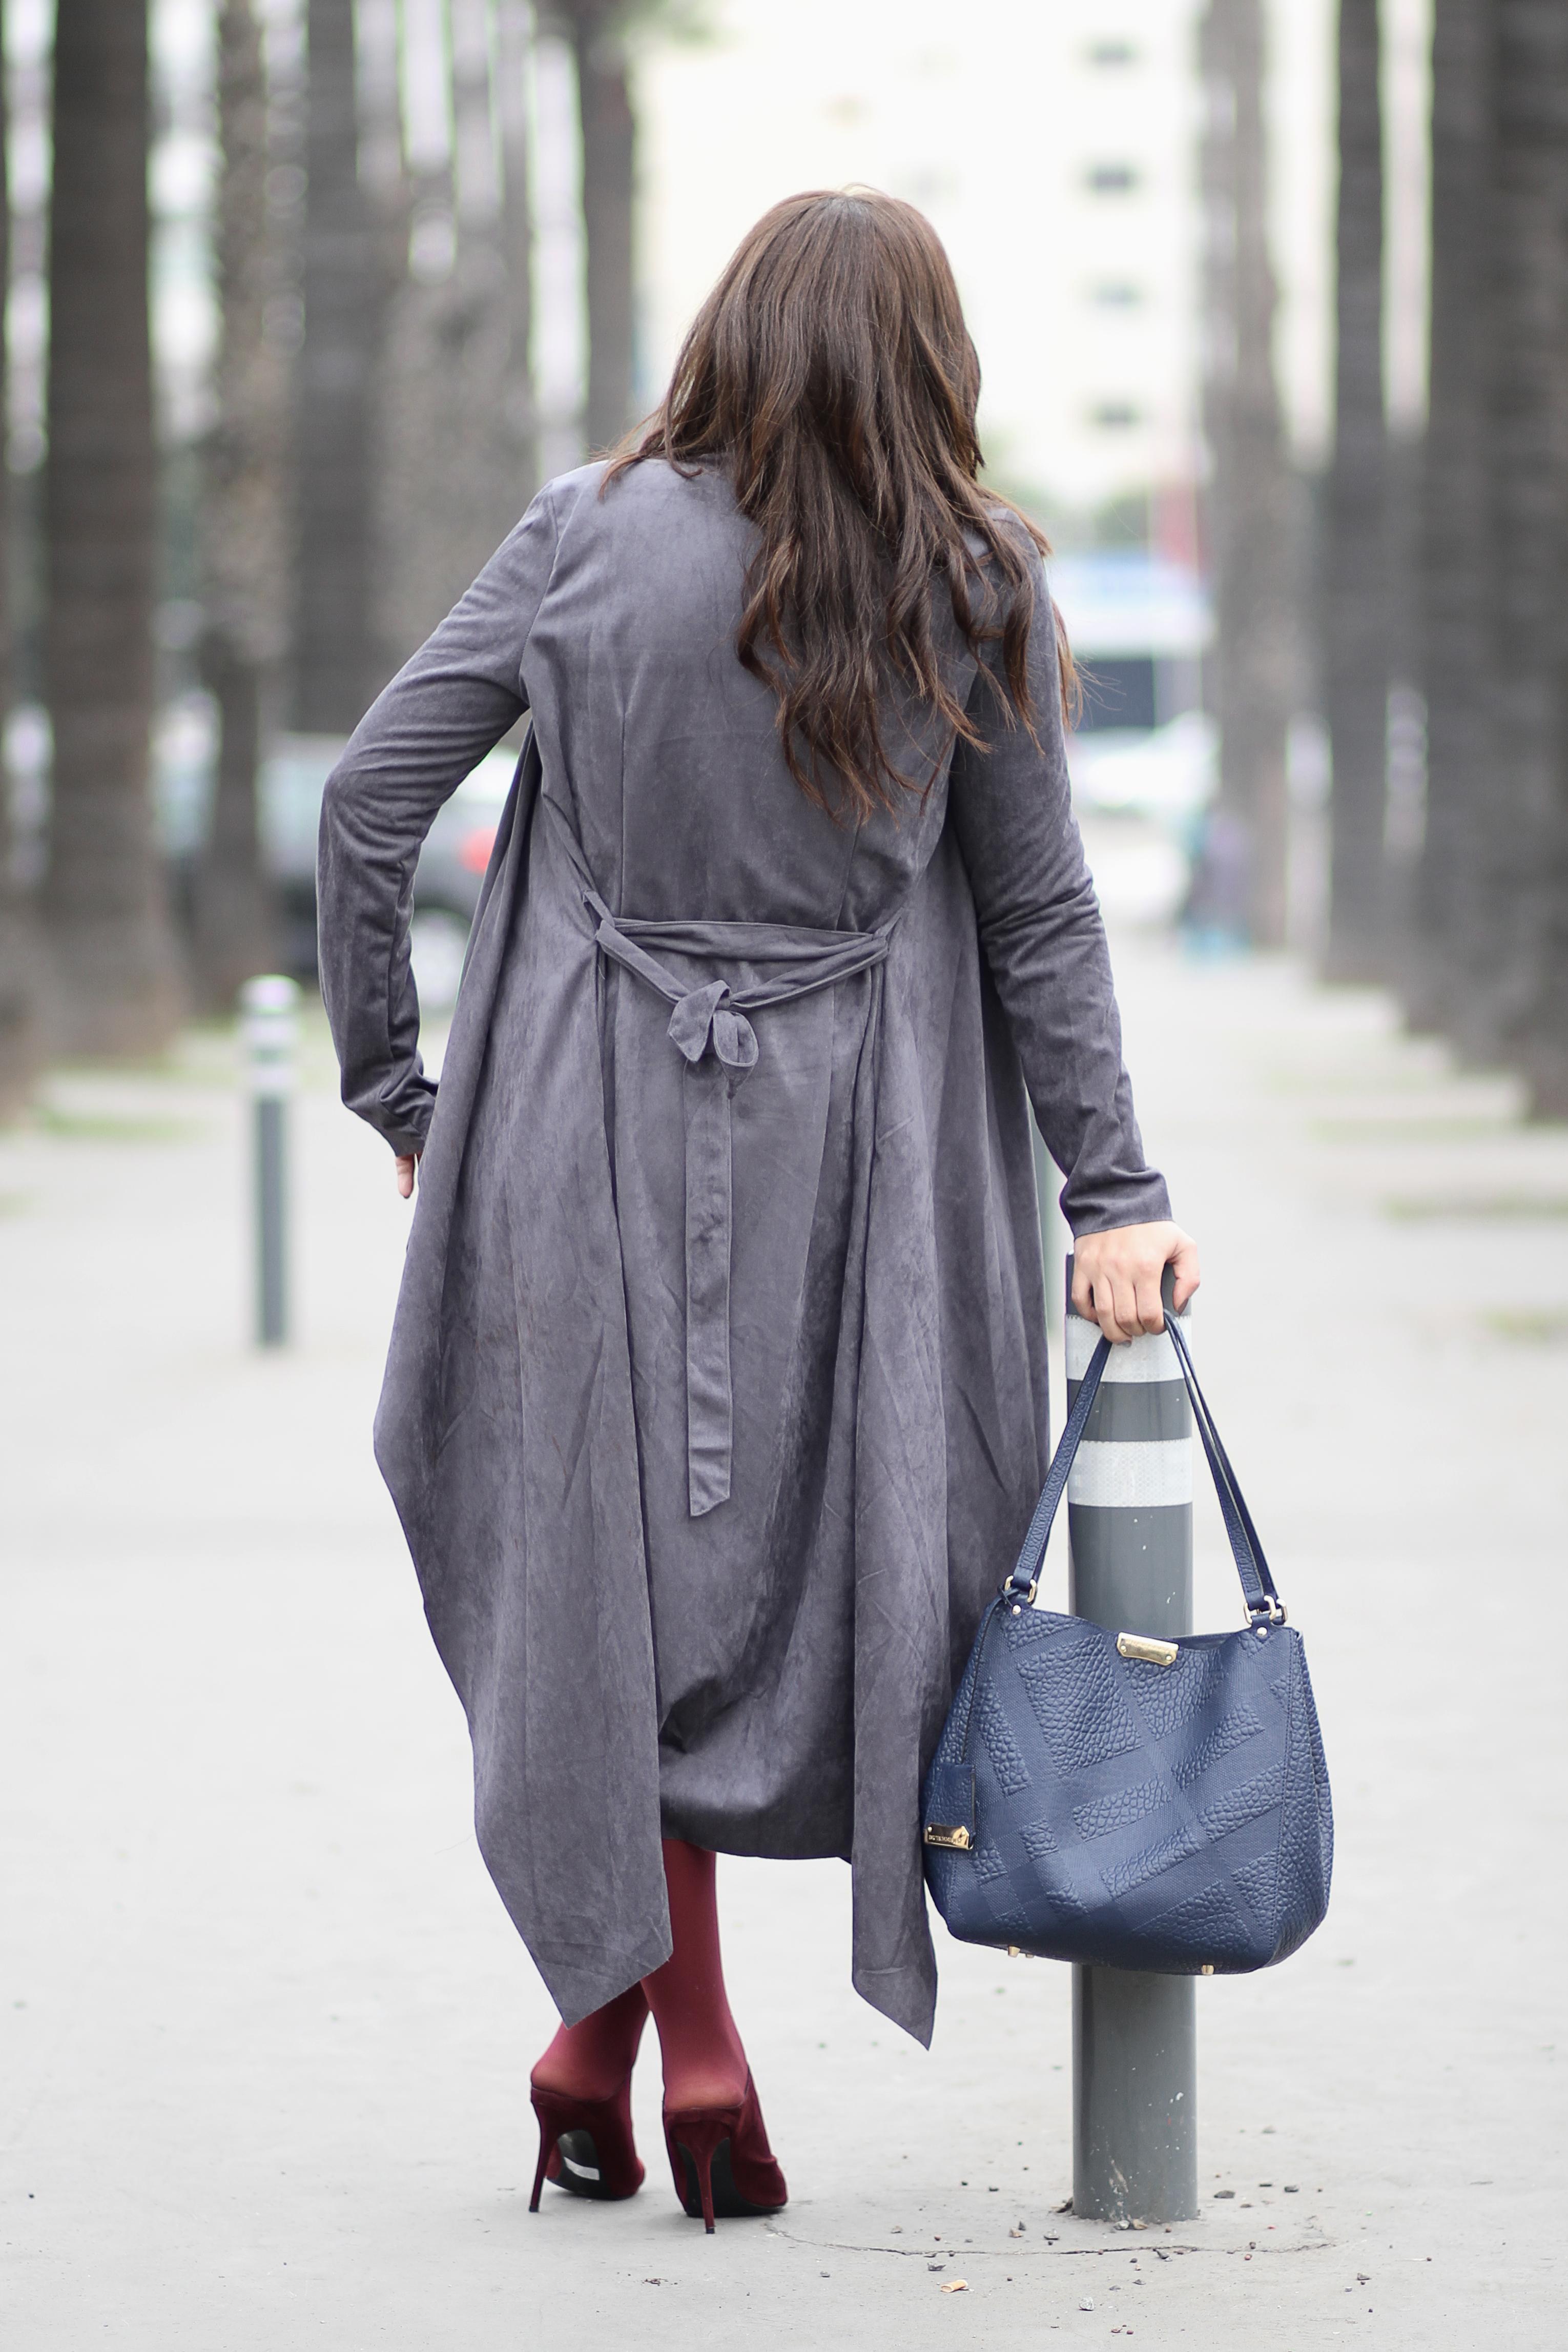 le-marsala-blog mode-chiccarpediem-1